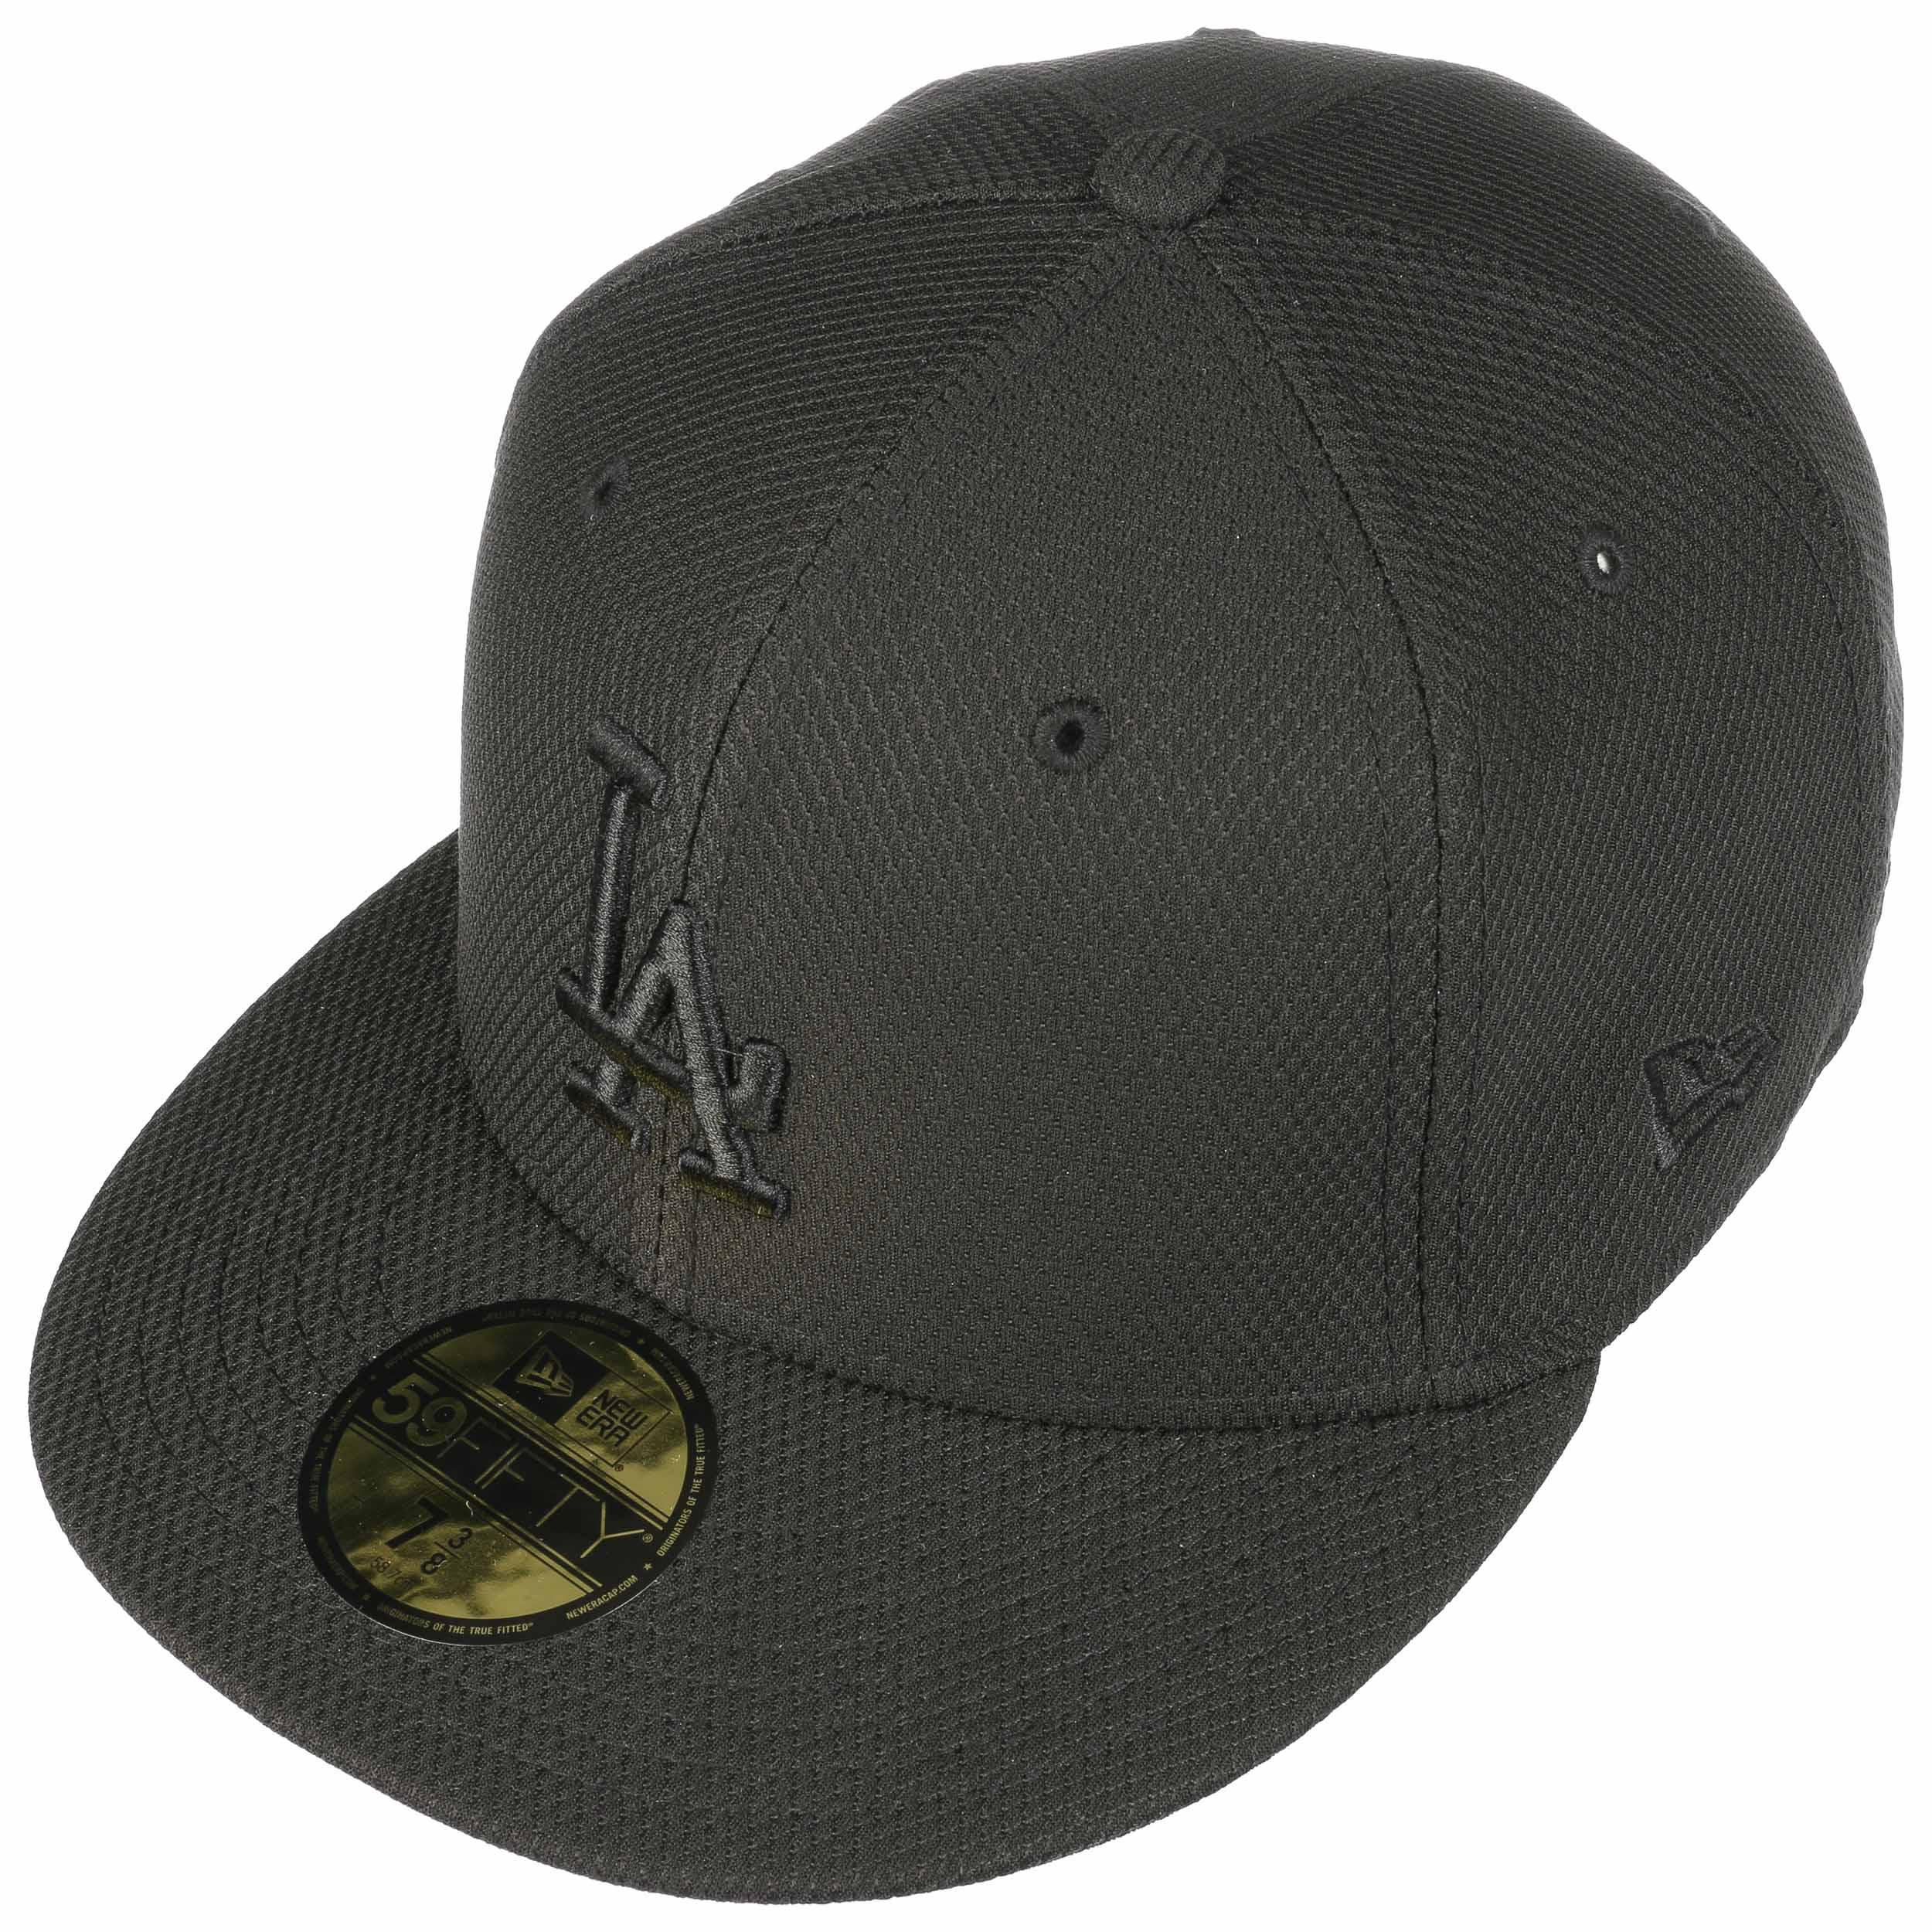 cd8df73ee 59Fifty Diamond MLB Dodgers Cap by New Era - black 1 ...